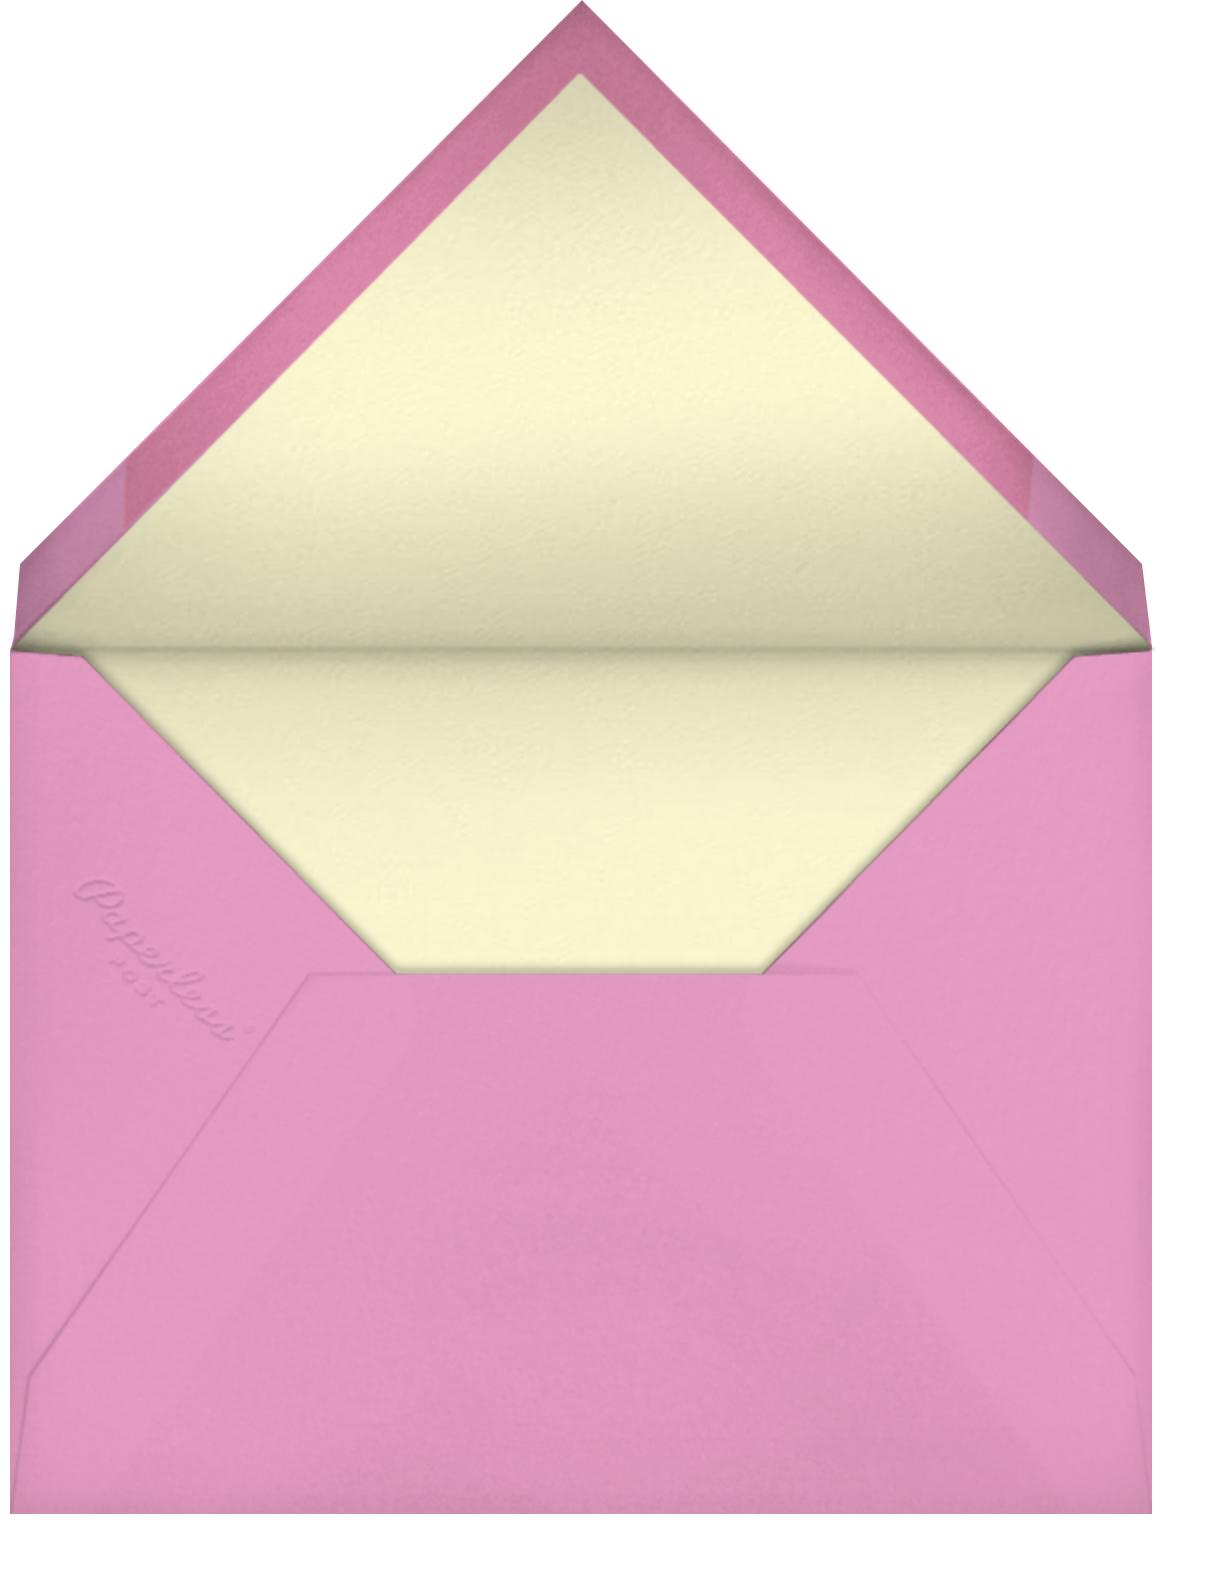 Painted Posies - Mauve - kate spade new york - Bridal shower - envelope back